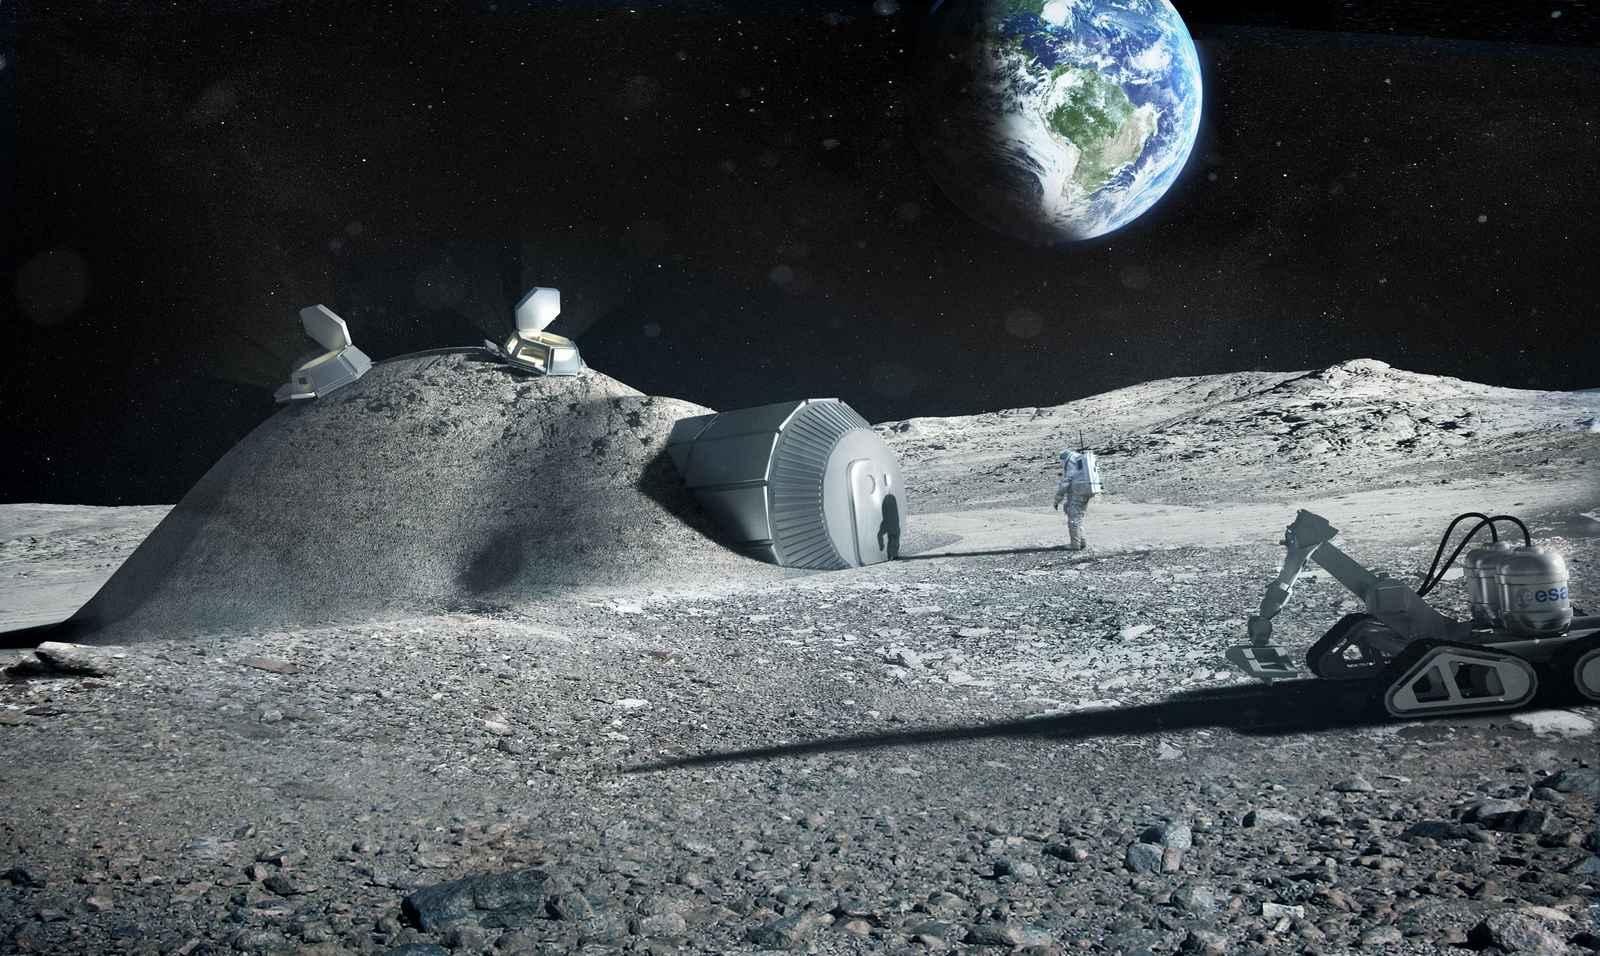 Lunar_base_moon